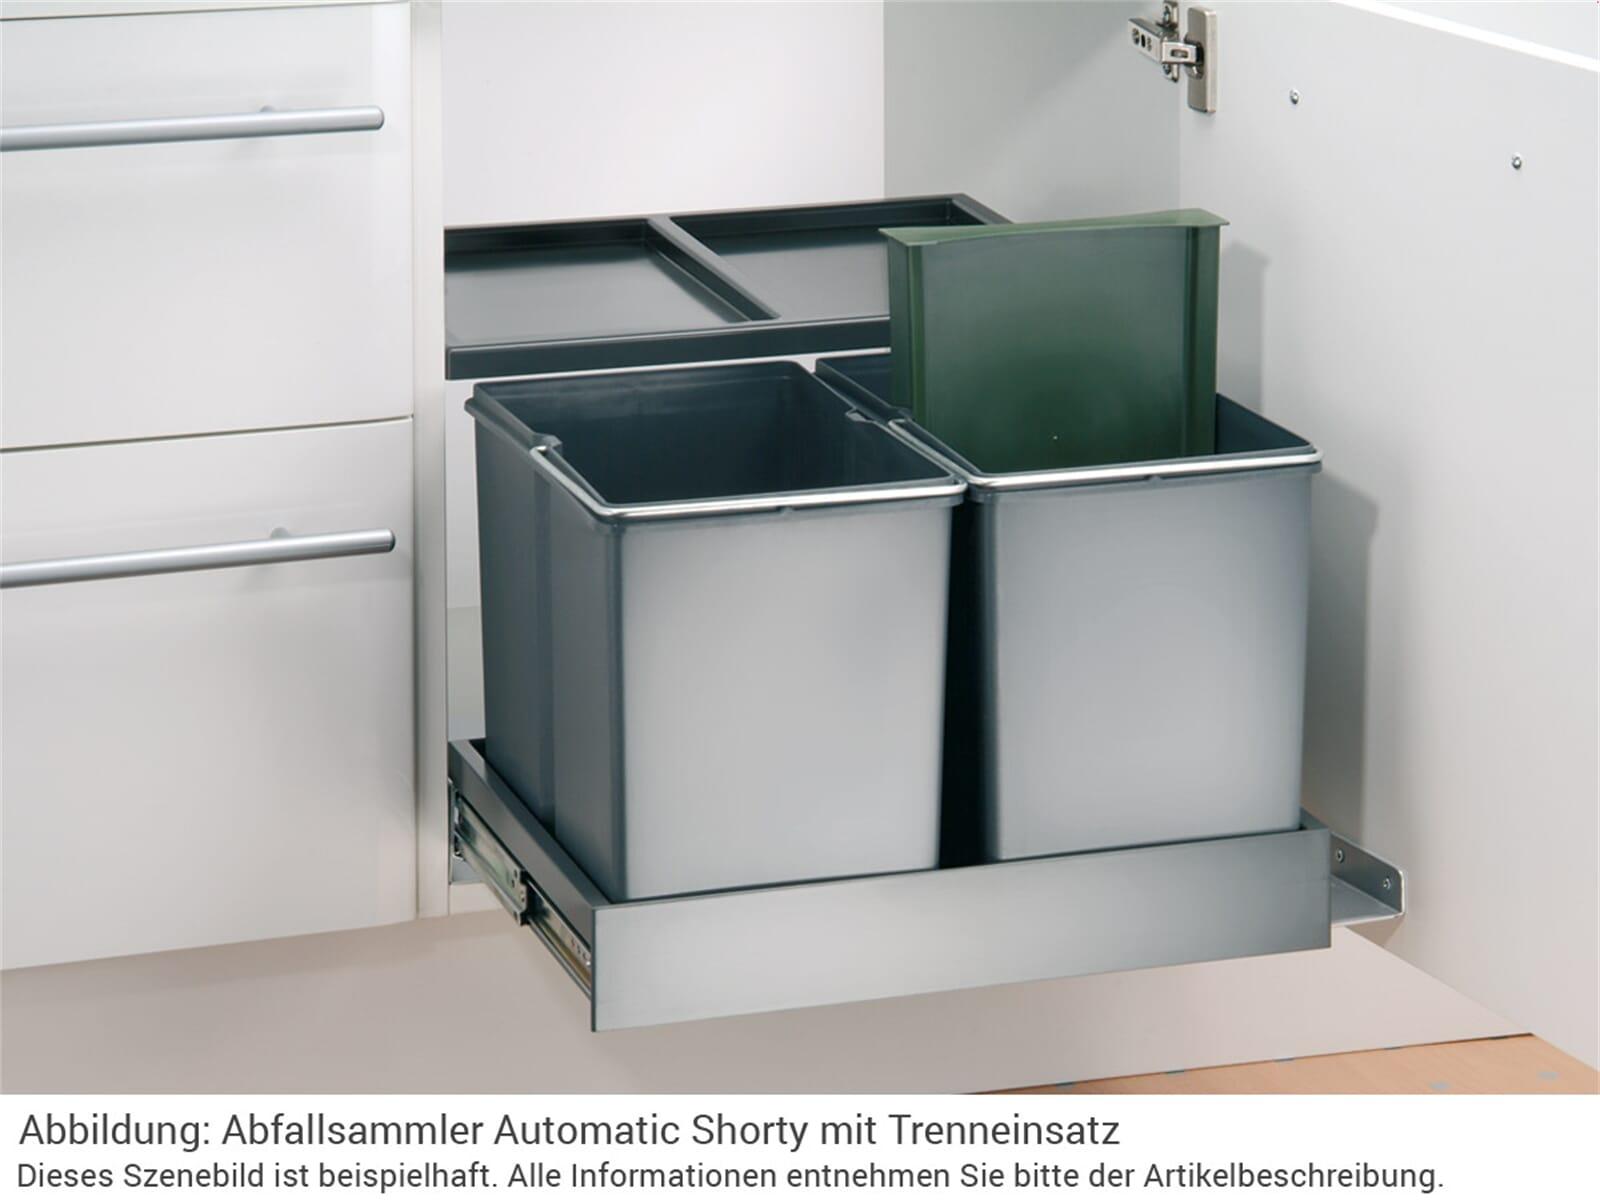 wesco automatic shorty 757311 11 einbau abfallsammler. Black Bedroom Furniture Sets. Home Design Ideas